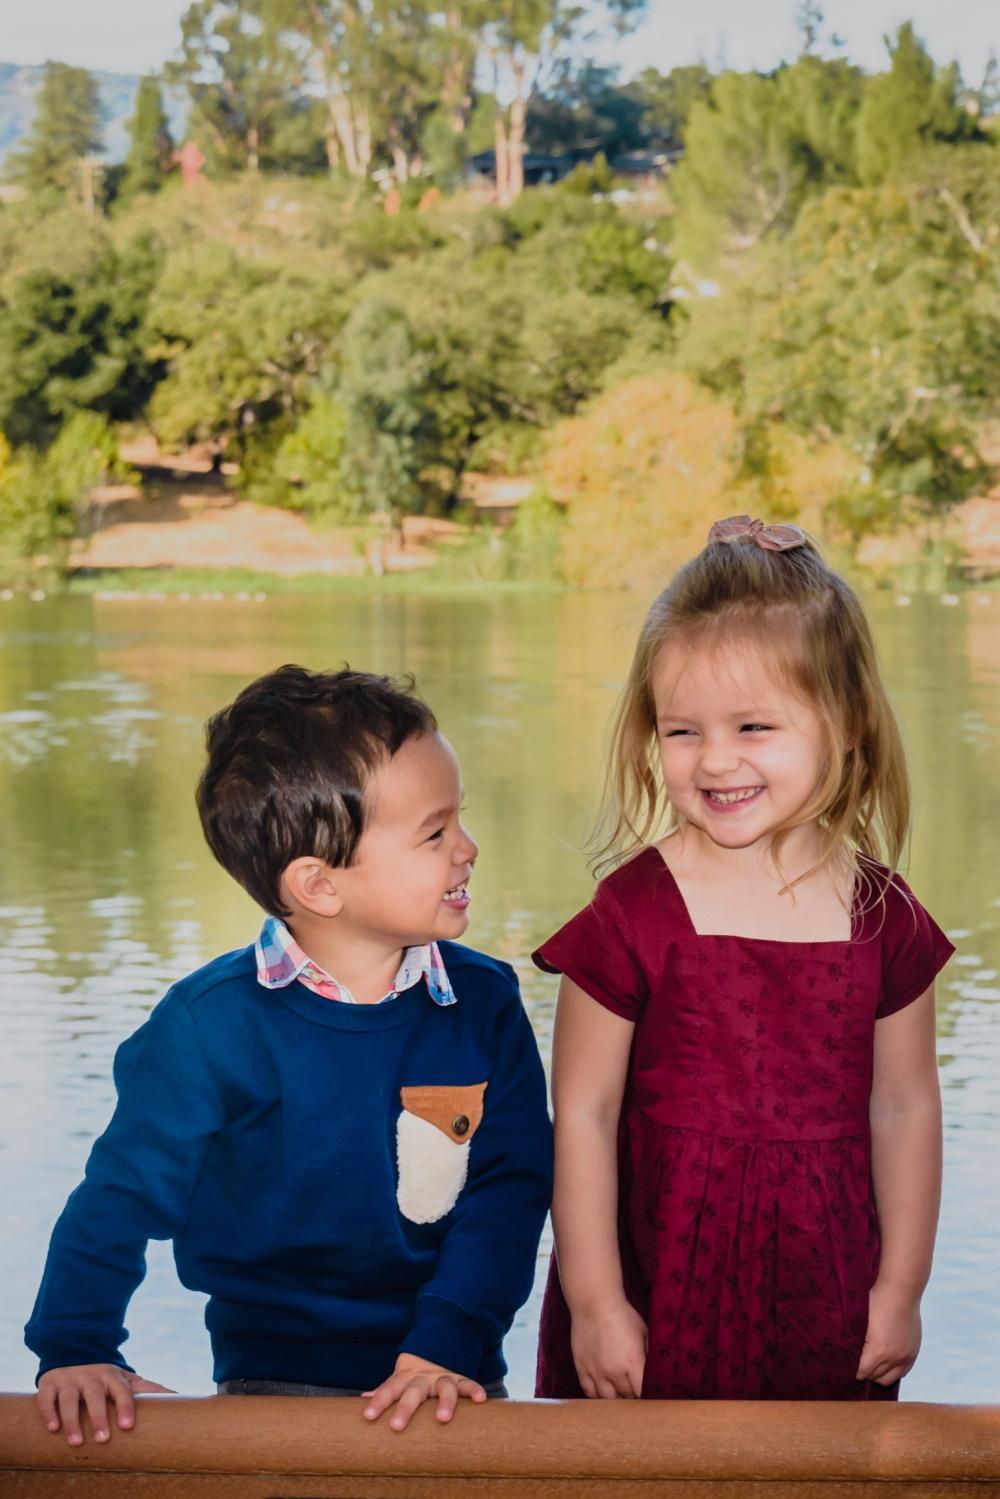 neilson family photography photographer bay area san jose san francisco vasona park campbell cousins